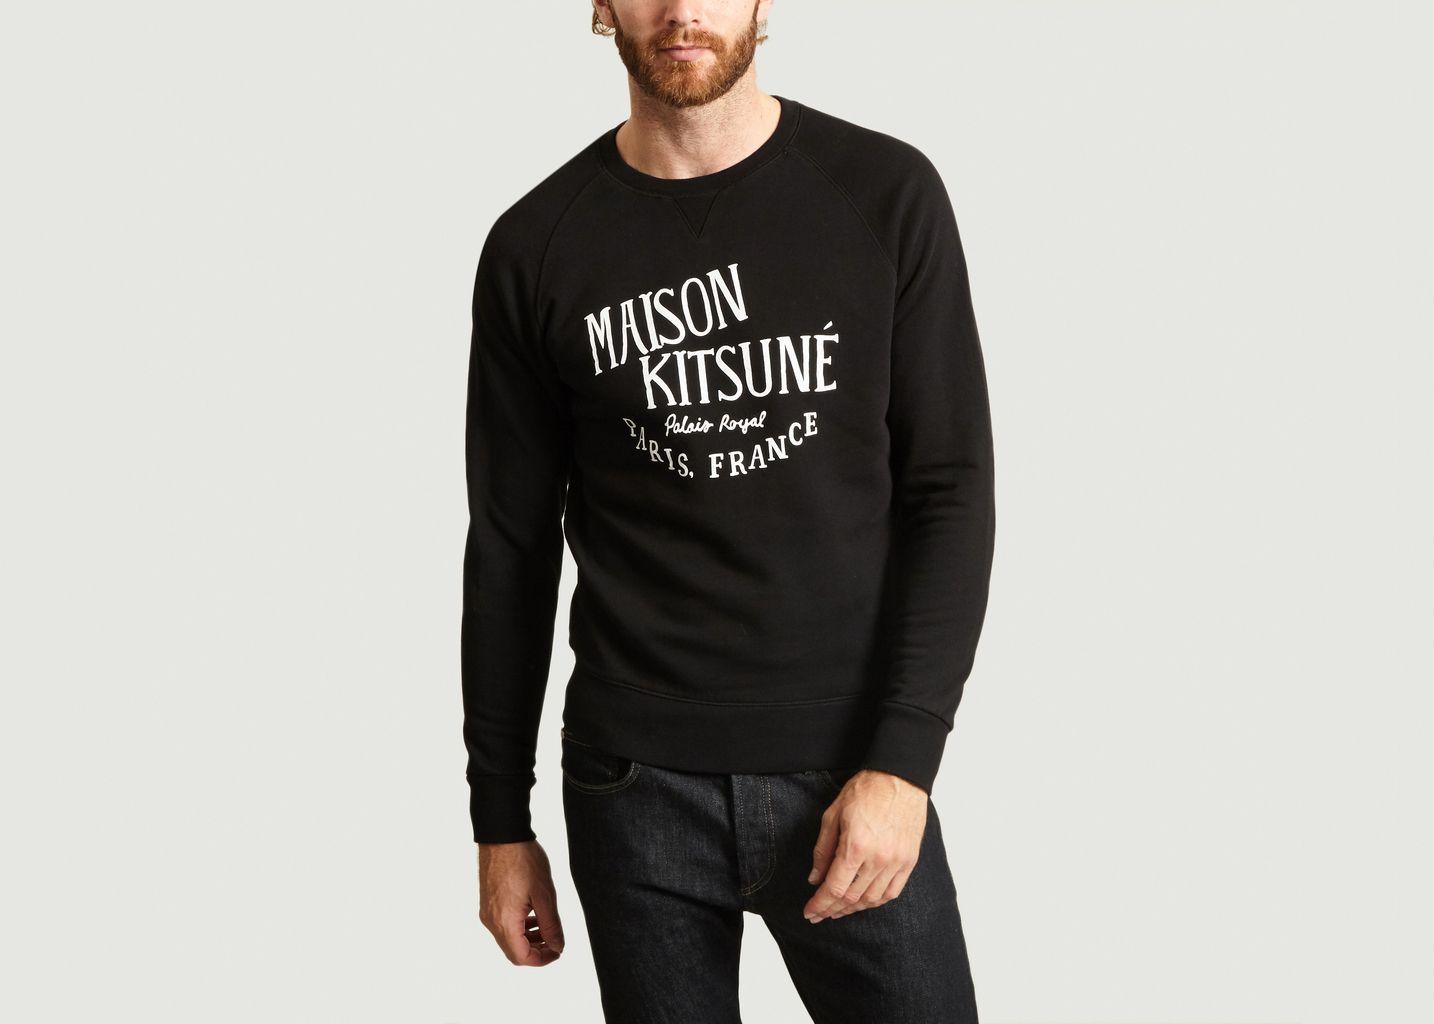 Sweatshirt MK - Maison Kitsuné